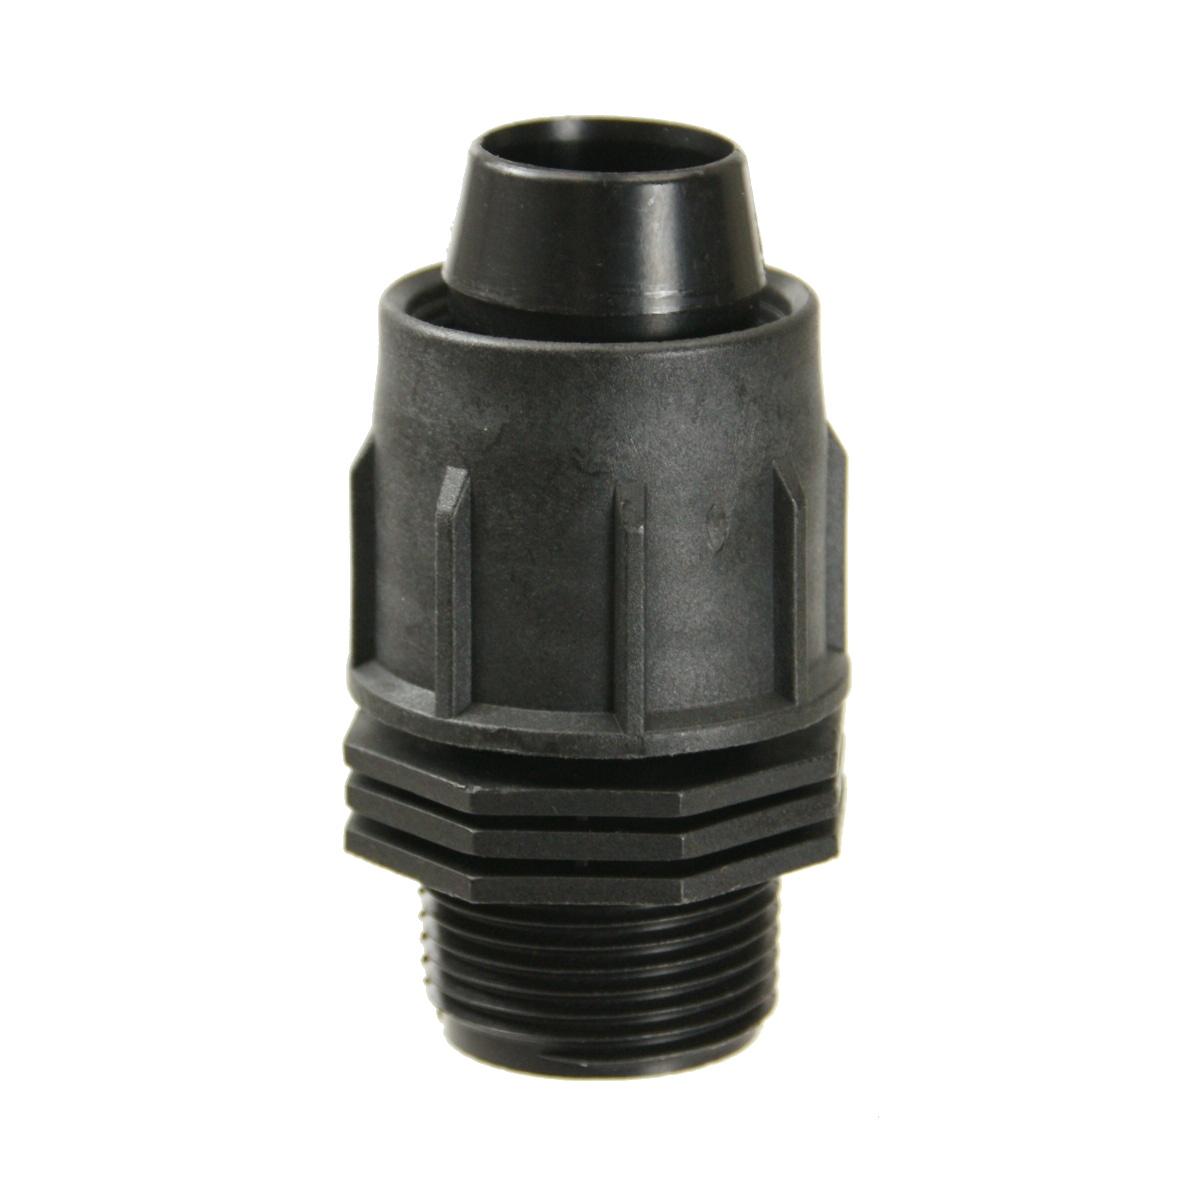 Perma-Loc Tubing Male Threads Adapter